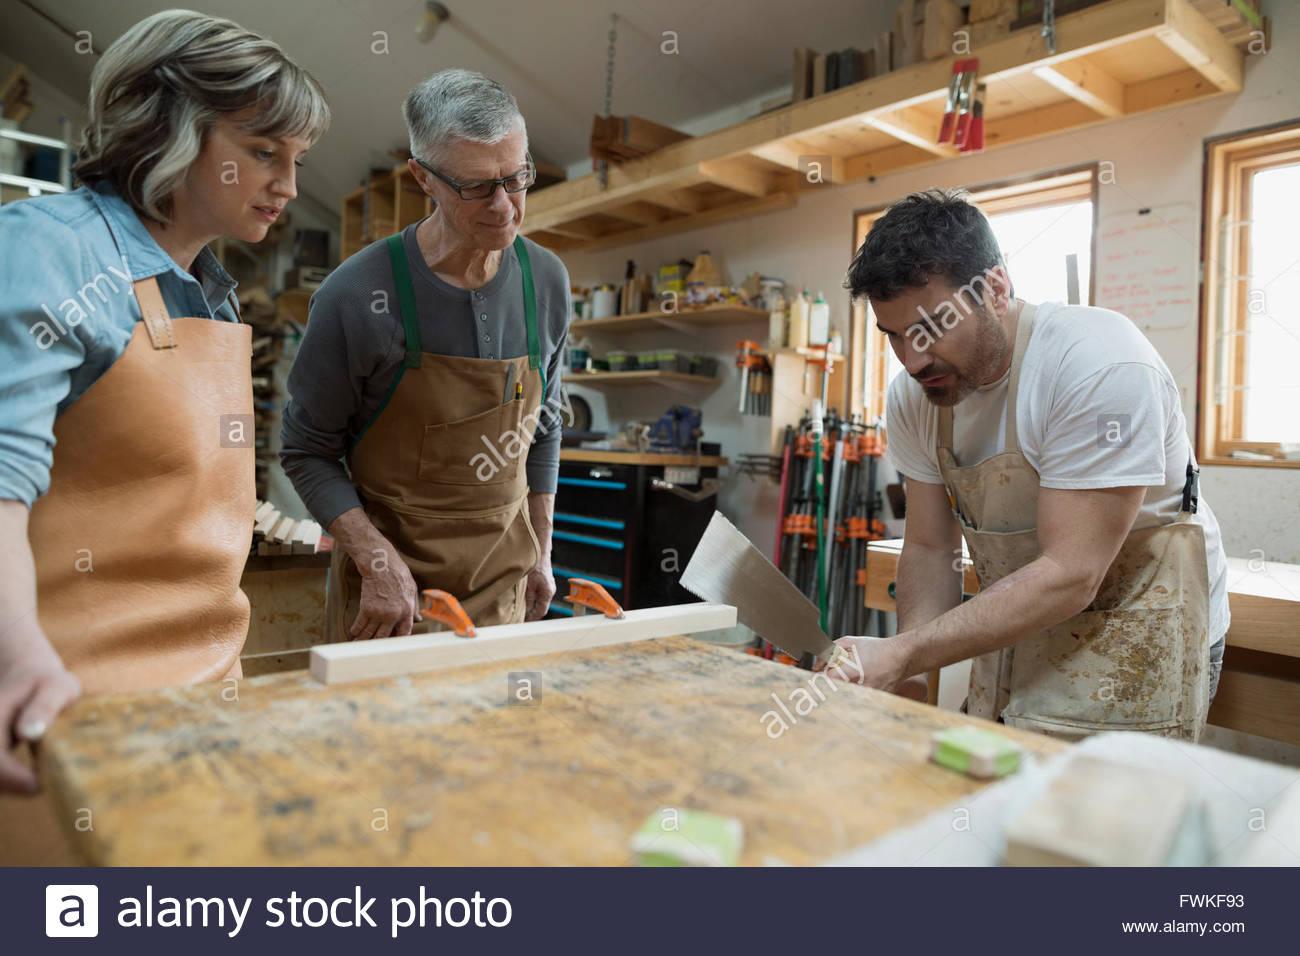 Charpentiers travaillant en atelier Photo Stock